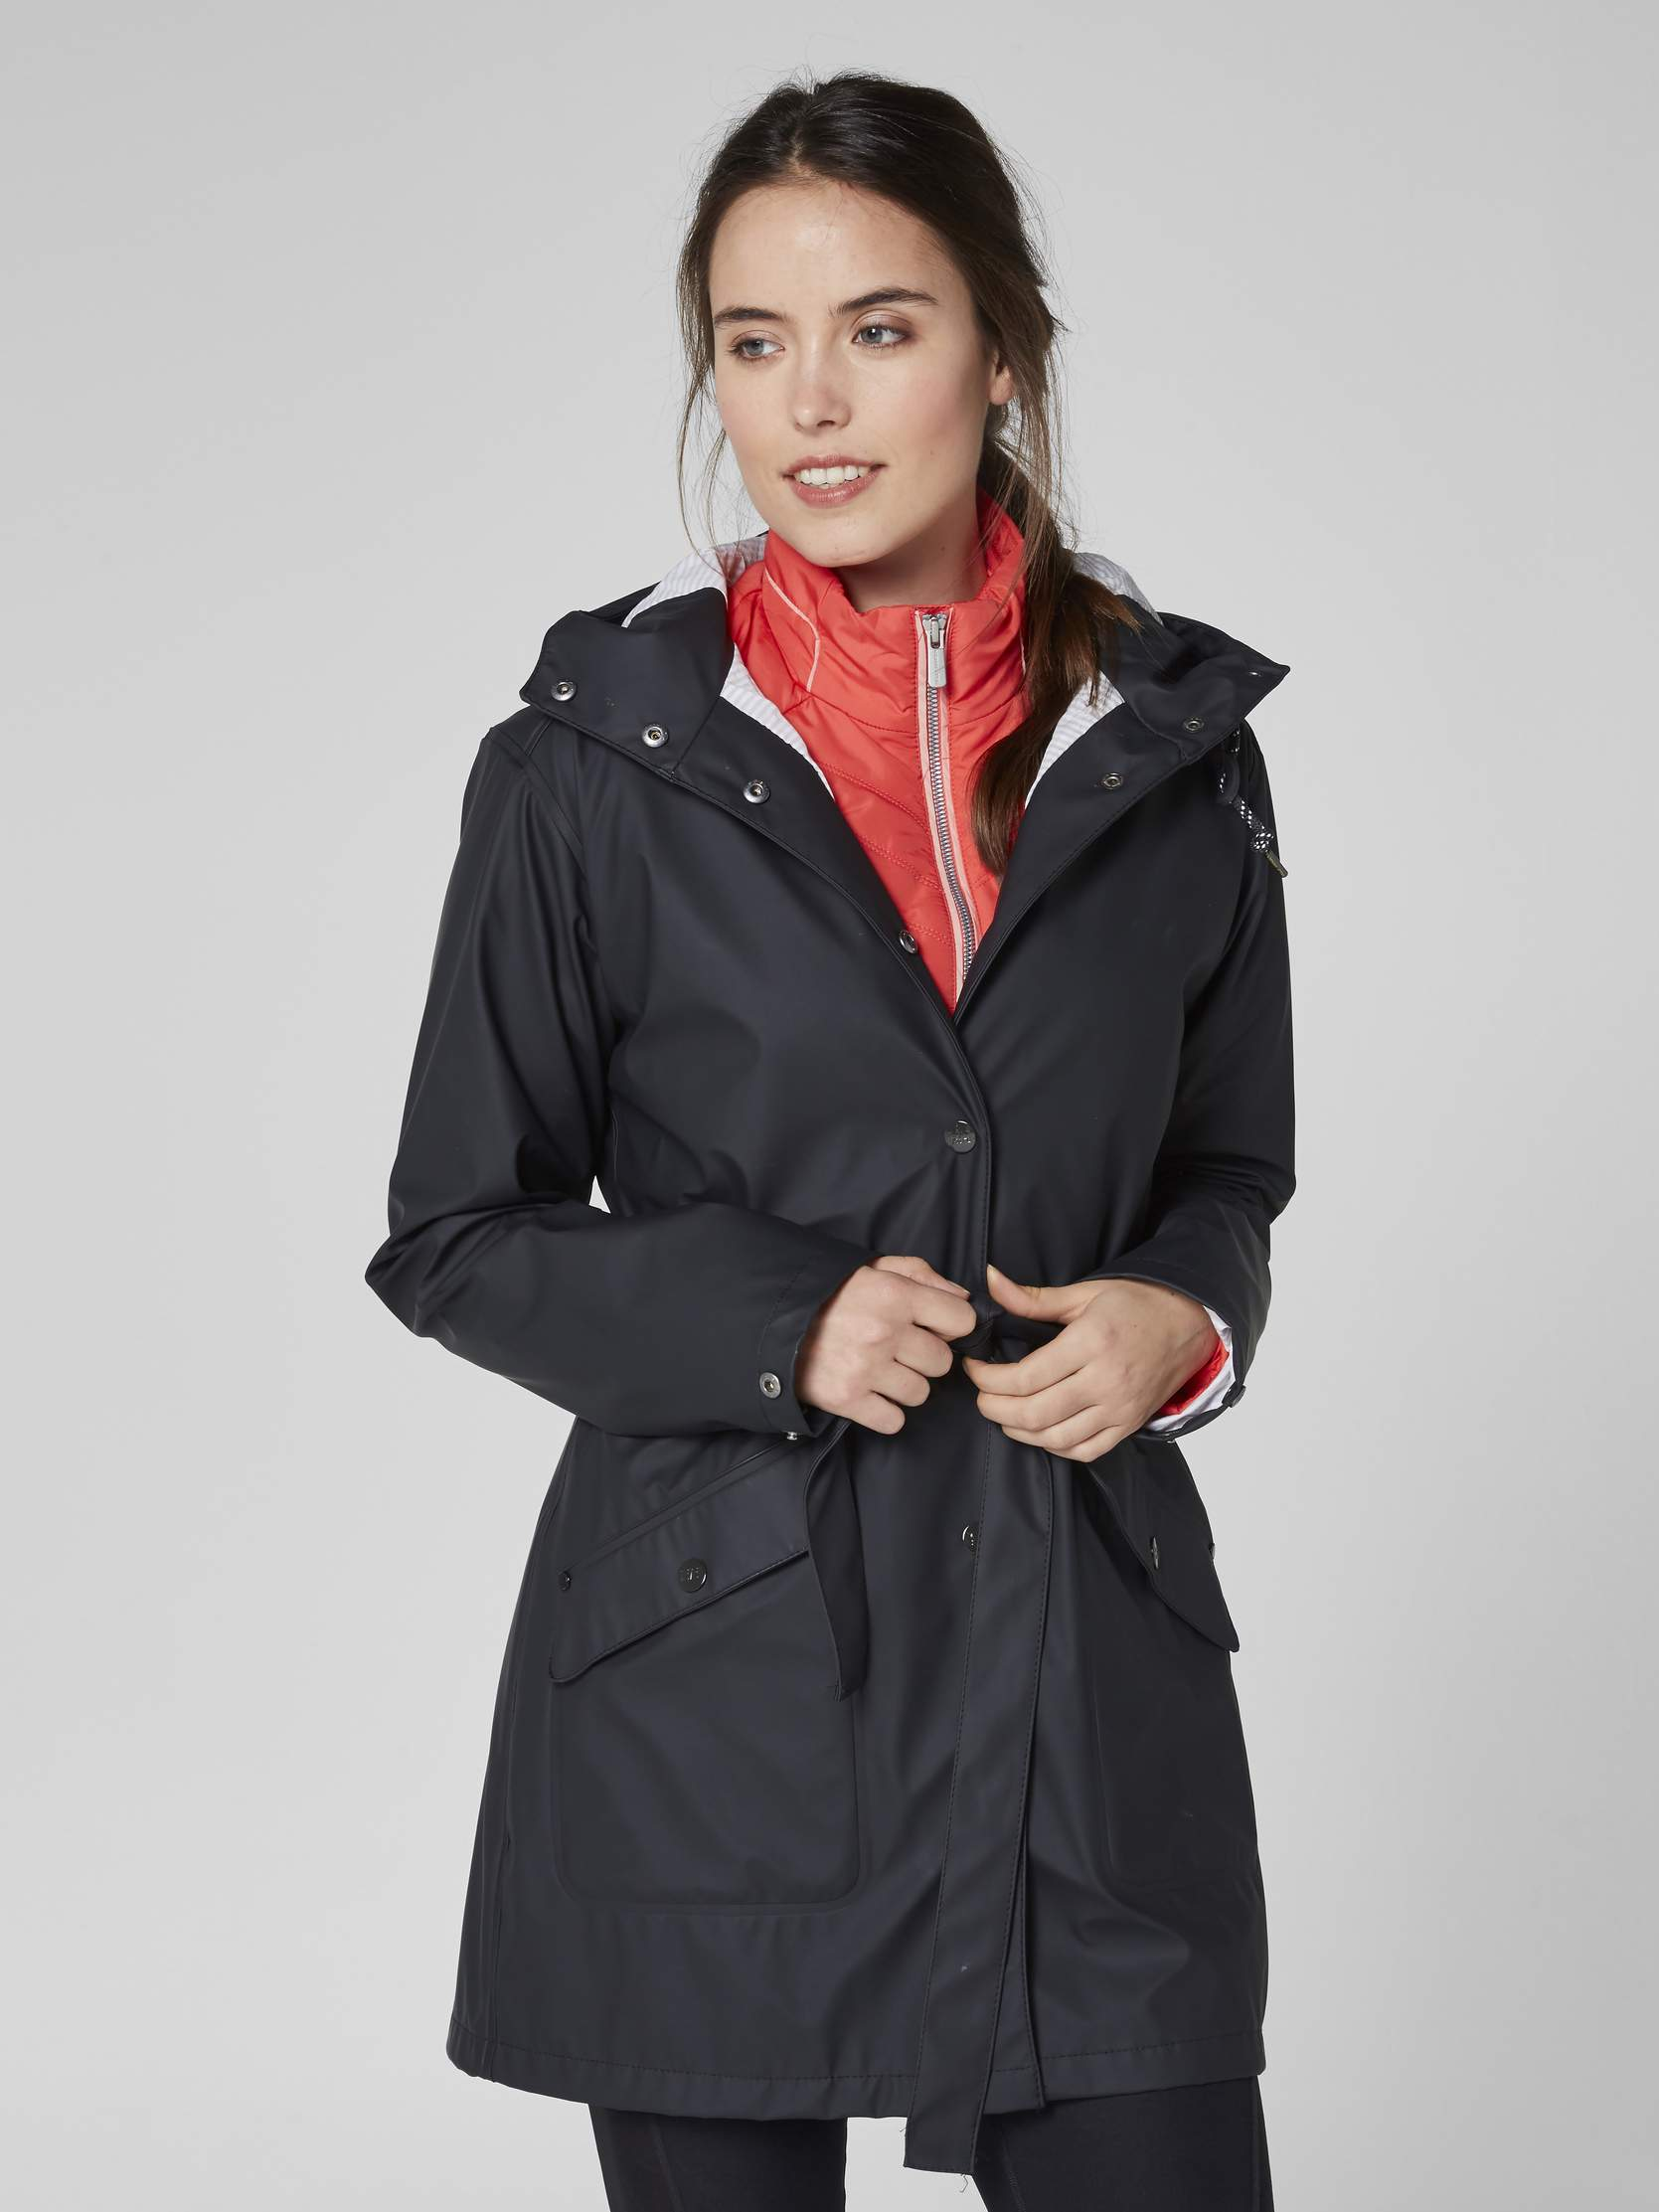 Helly hansen black kirkwall rain jacket